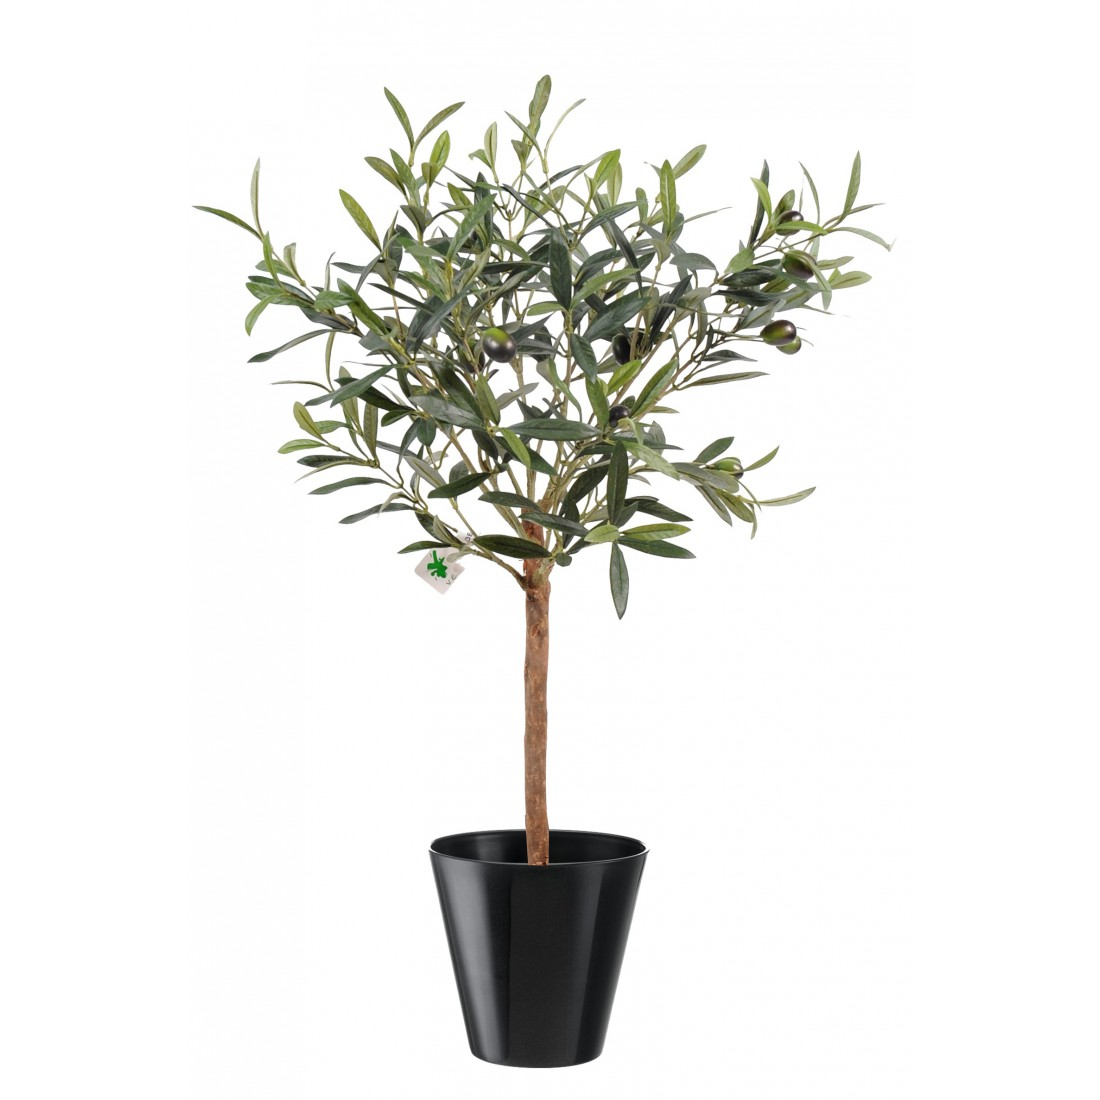 Olivier artificiel plant en pot 35cm arbres mediterraneens oliviers artificiels factice - Entretien olivier en pot ...